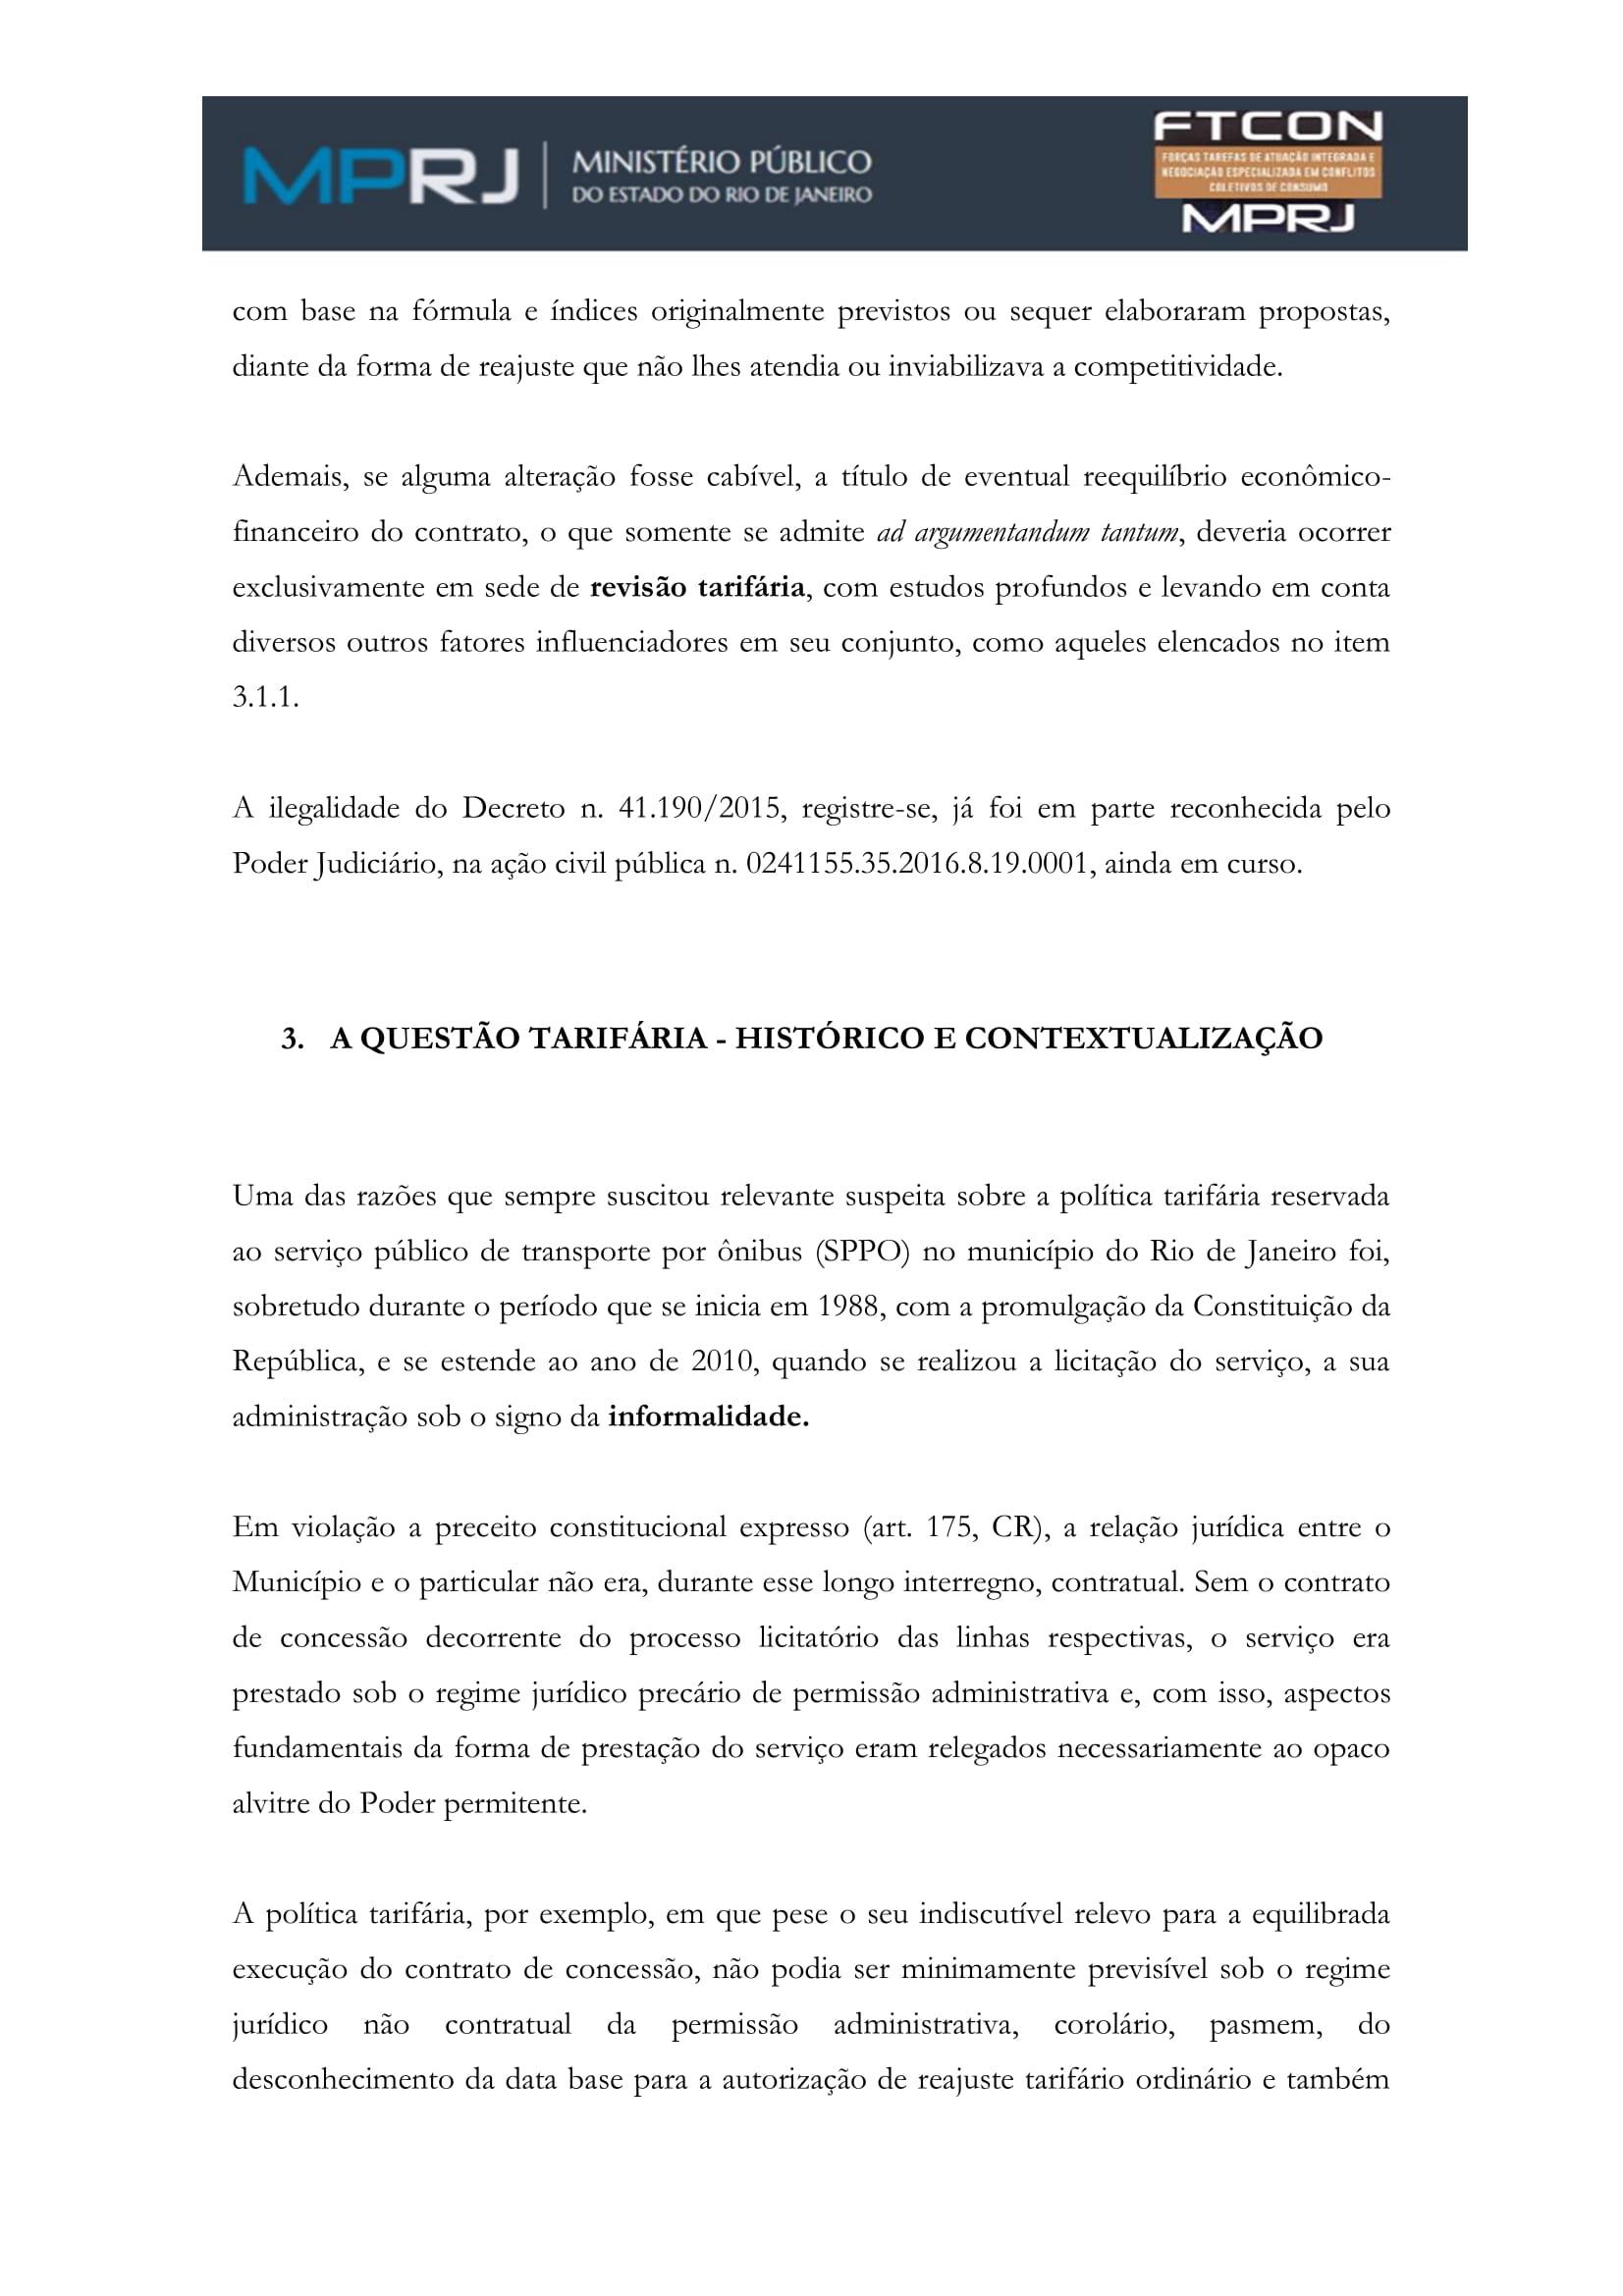 acp_caducidade_onibus_dr_rt-058